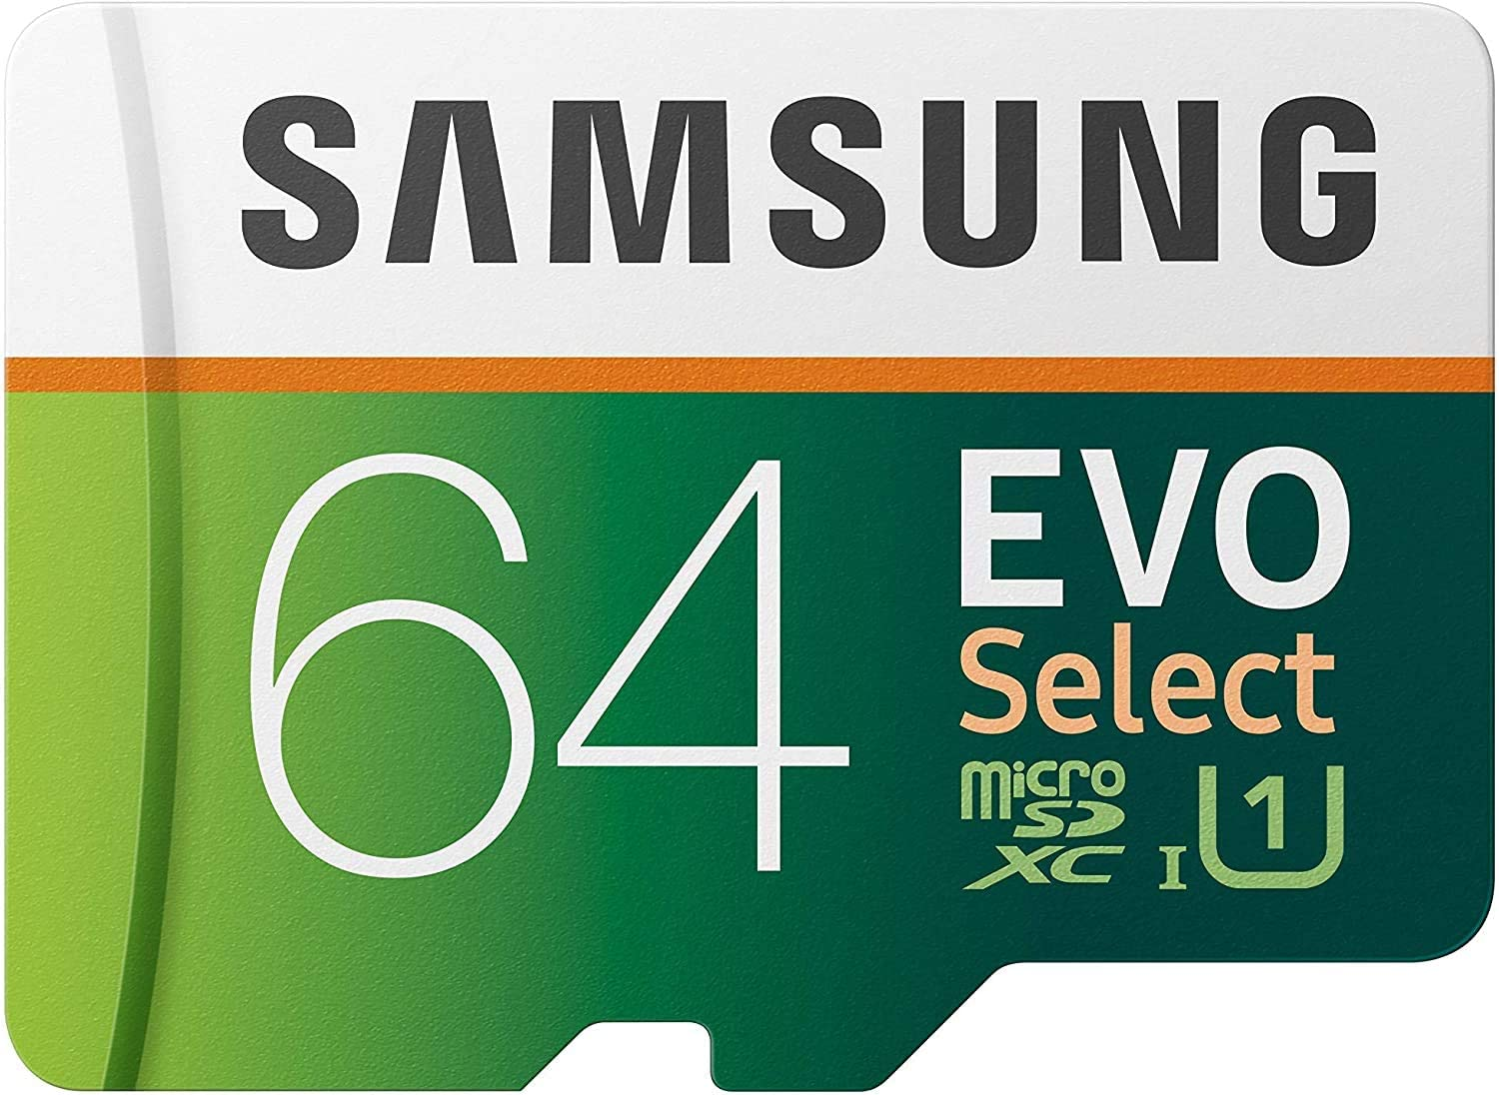 SDHC Memory Cards 2 Pack Samsung VP-D461 Digital Camera Memory Card 2 x 8GB Secure Digital High Capacity